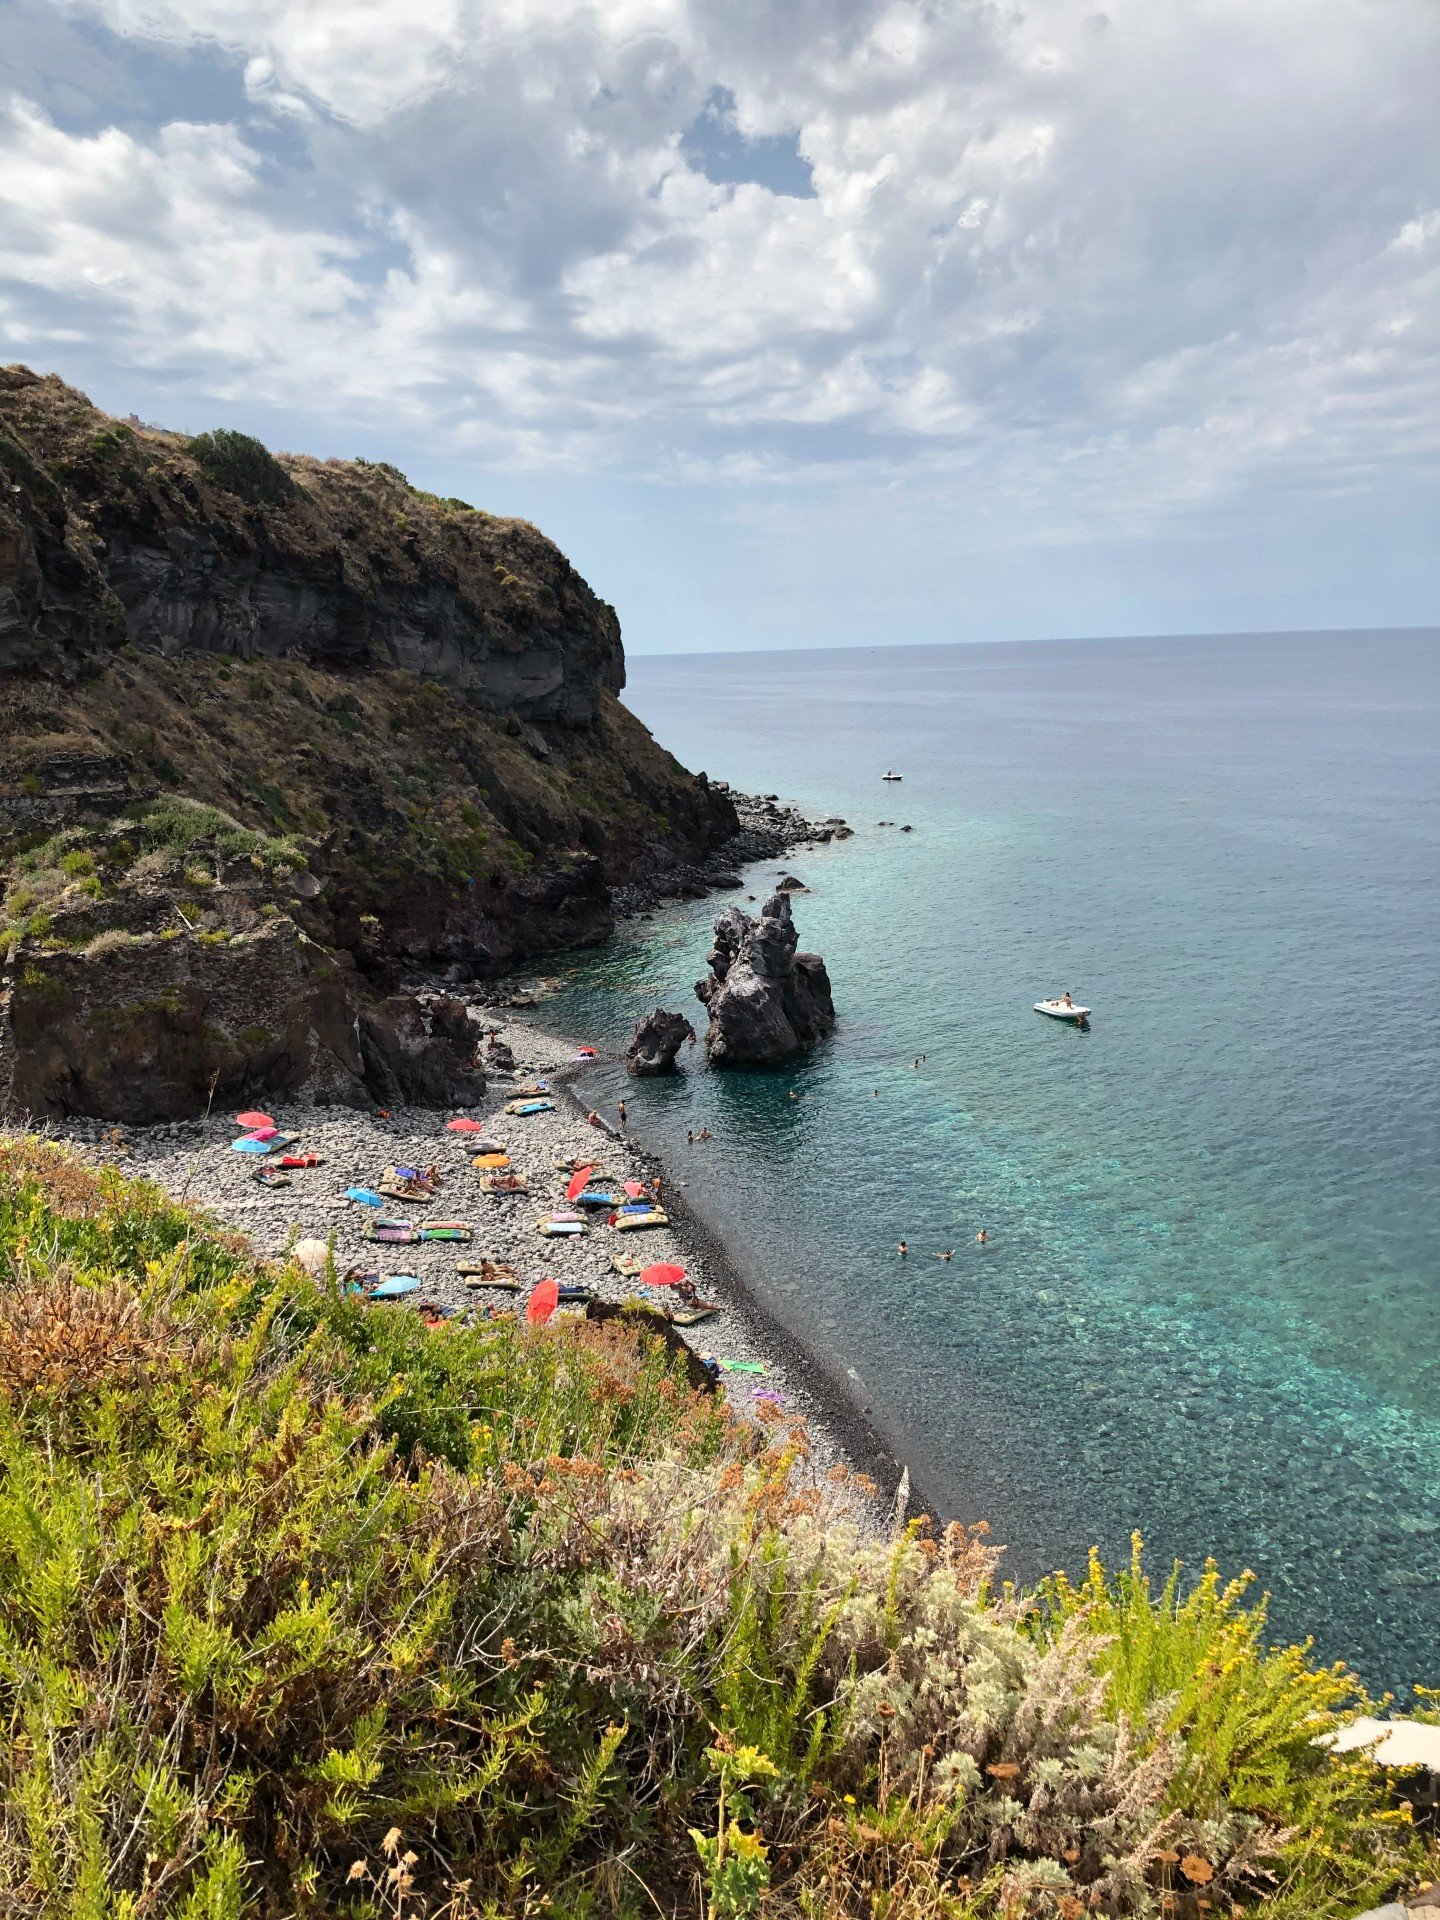 Salina Punta Scario 1 ALLA SCOPERTA DI SALINA